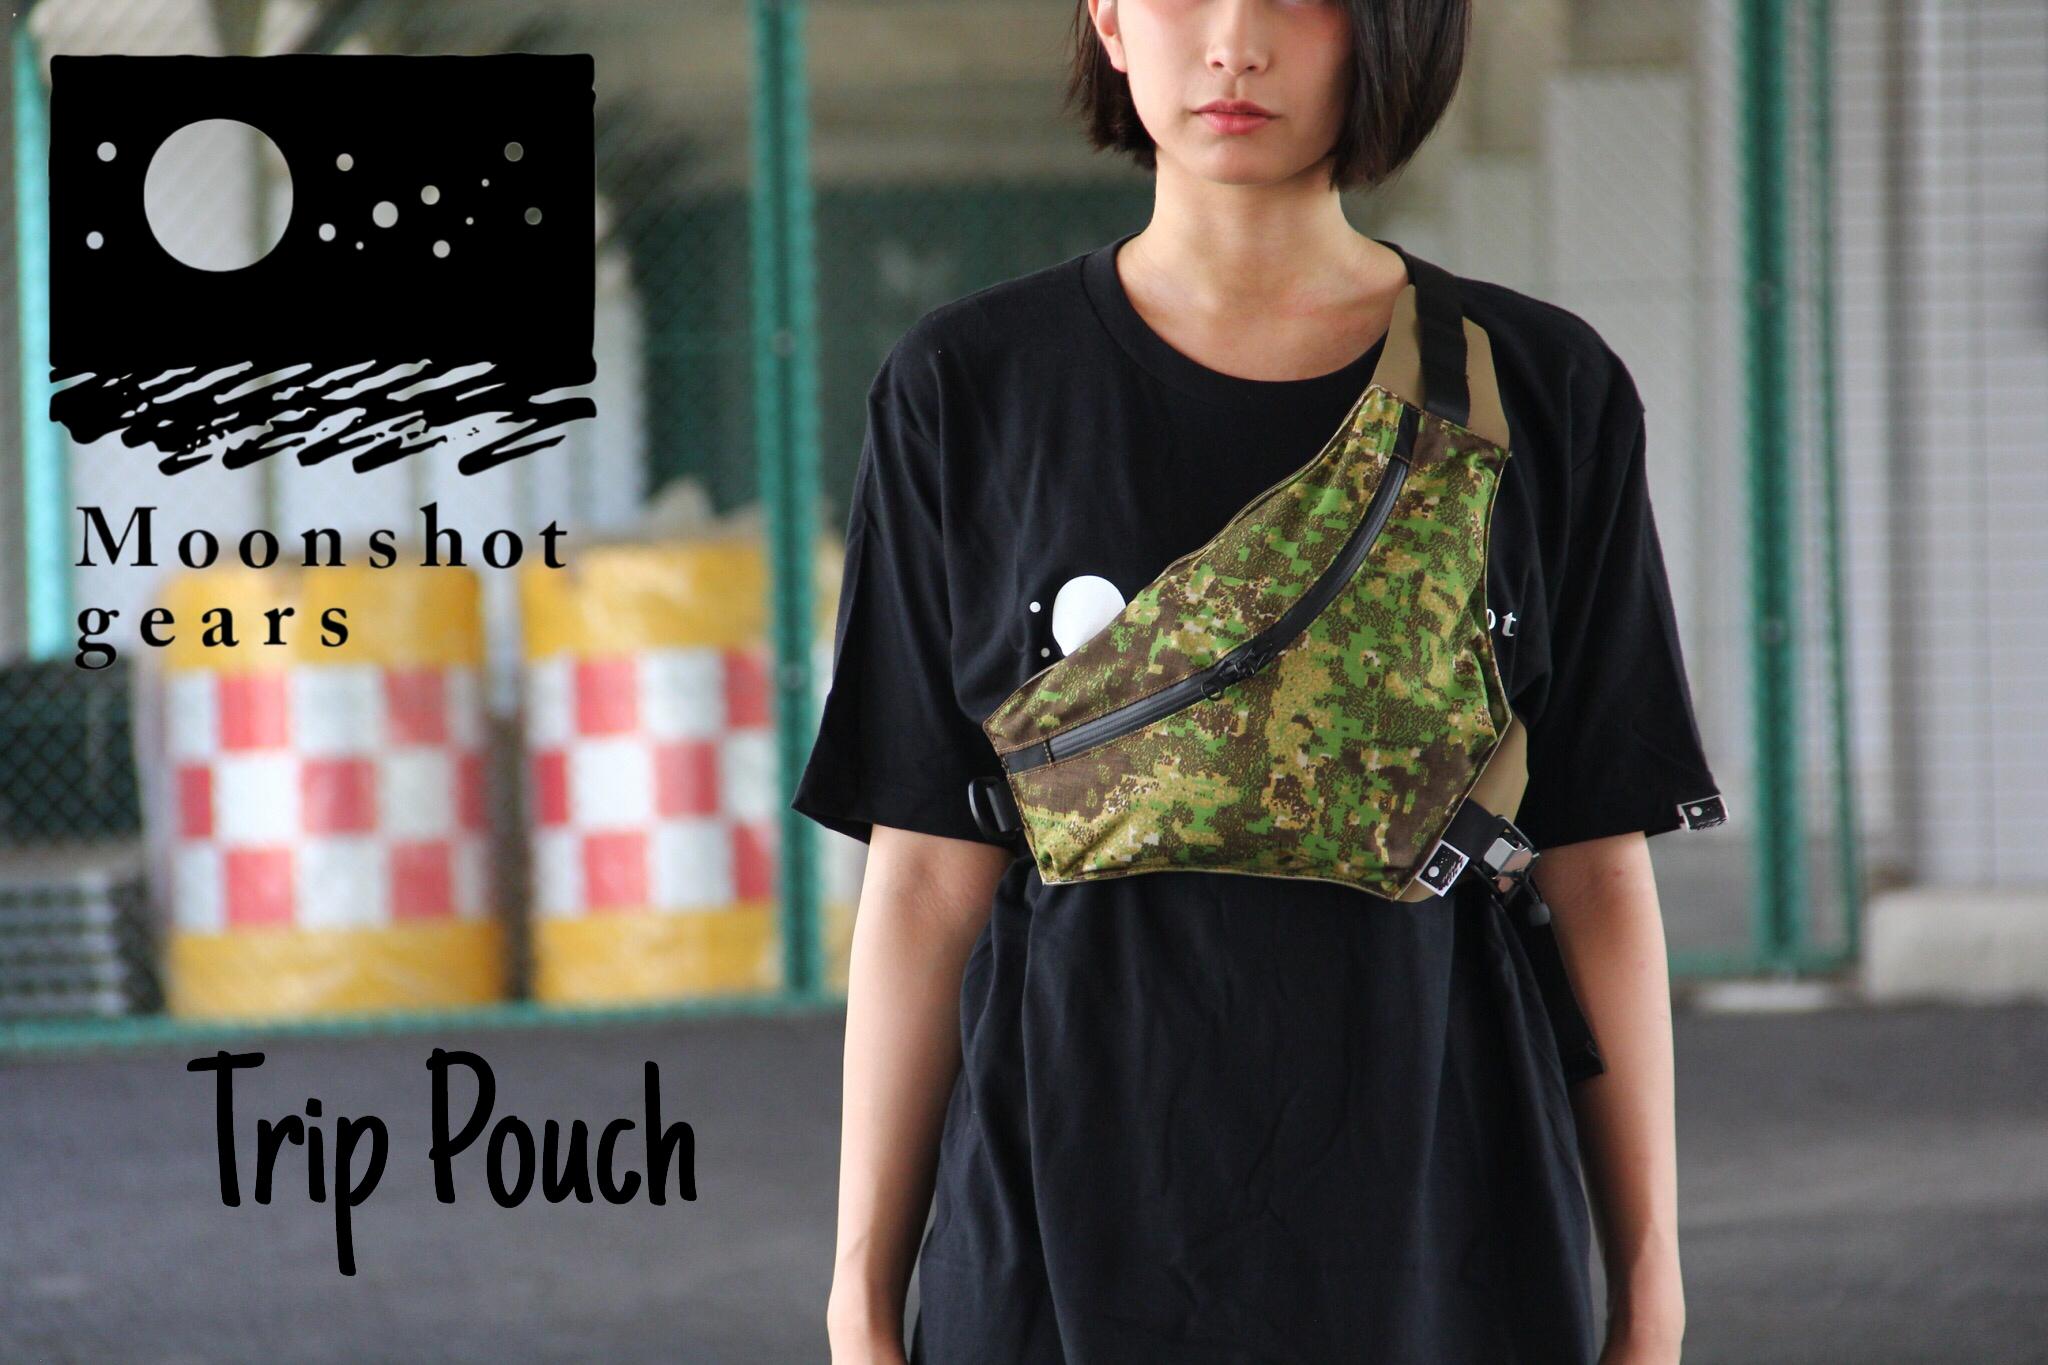 Trip pouch (在庫品)